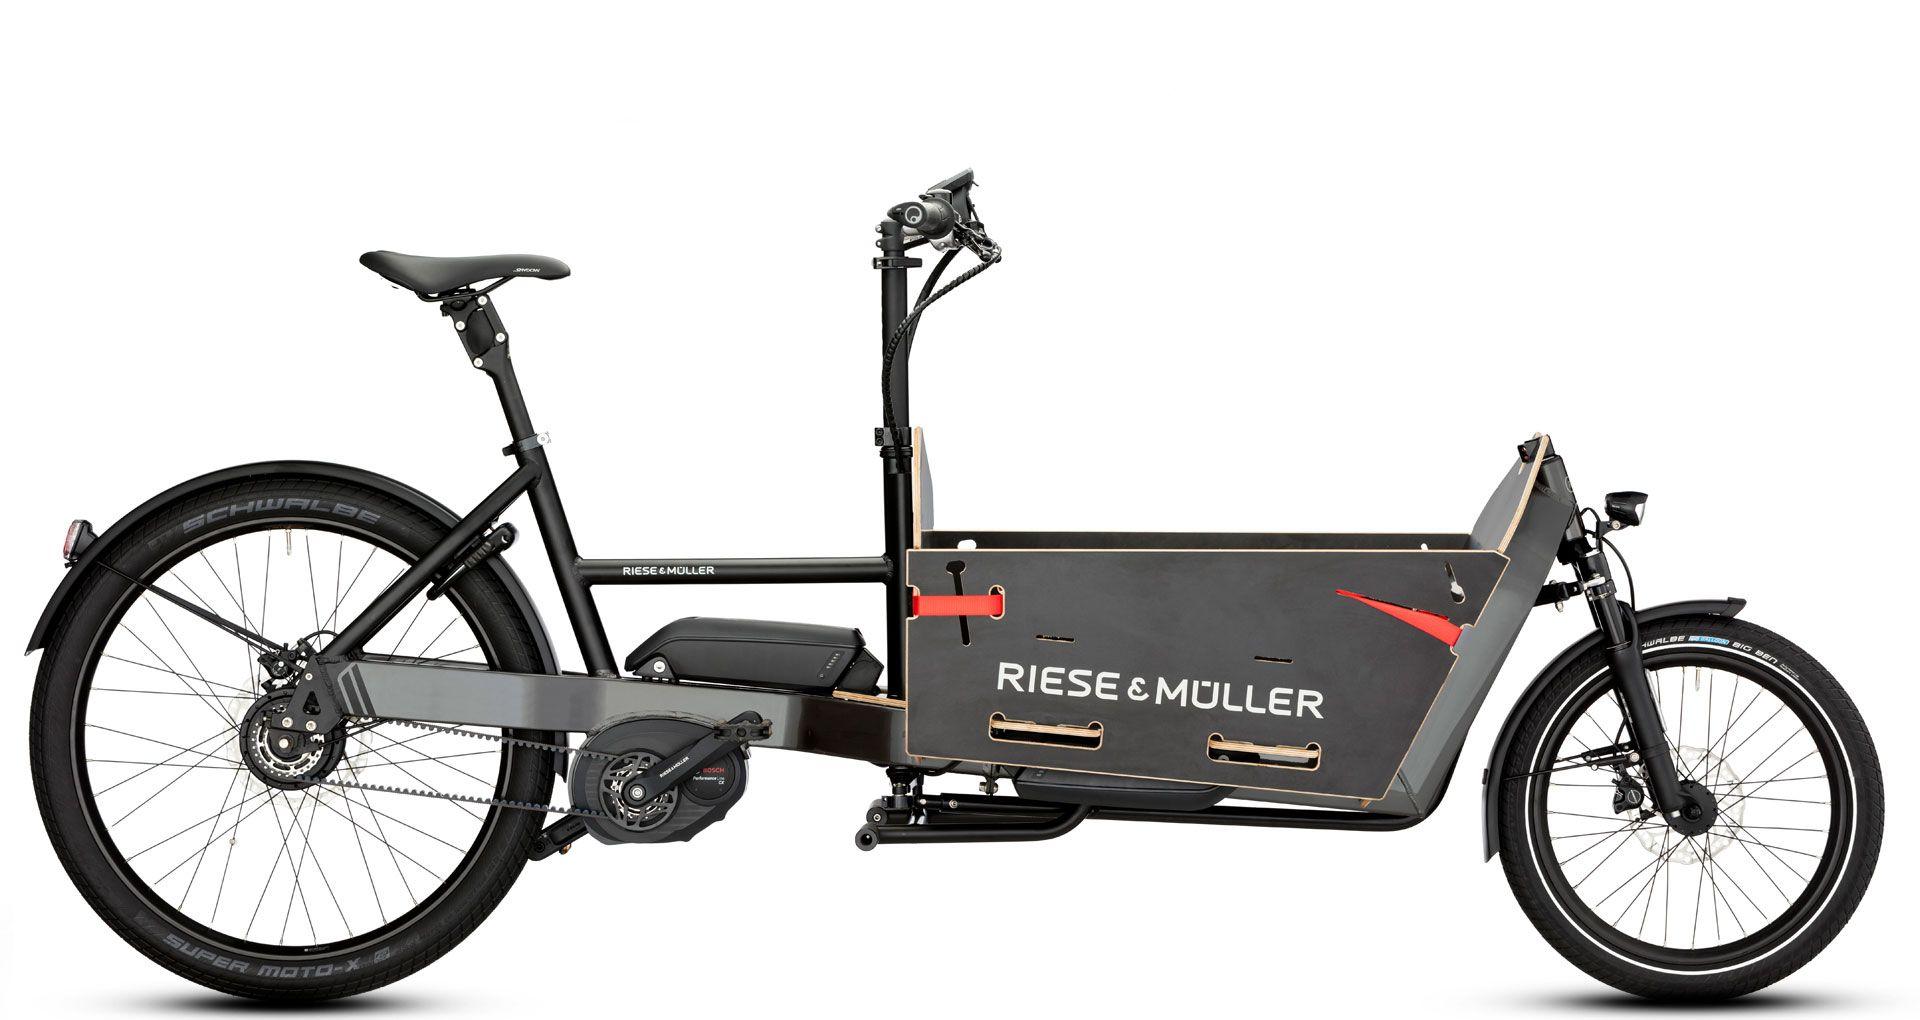 Riese And Muller Packster 70 The New Wheel San Francisco Marin Cargo Bike Bike Electric Cargo Bike